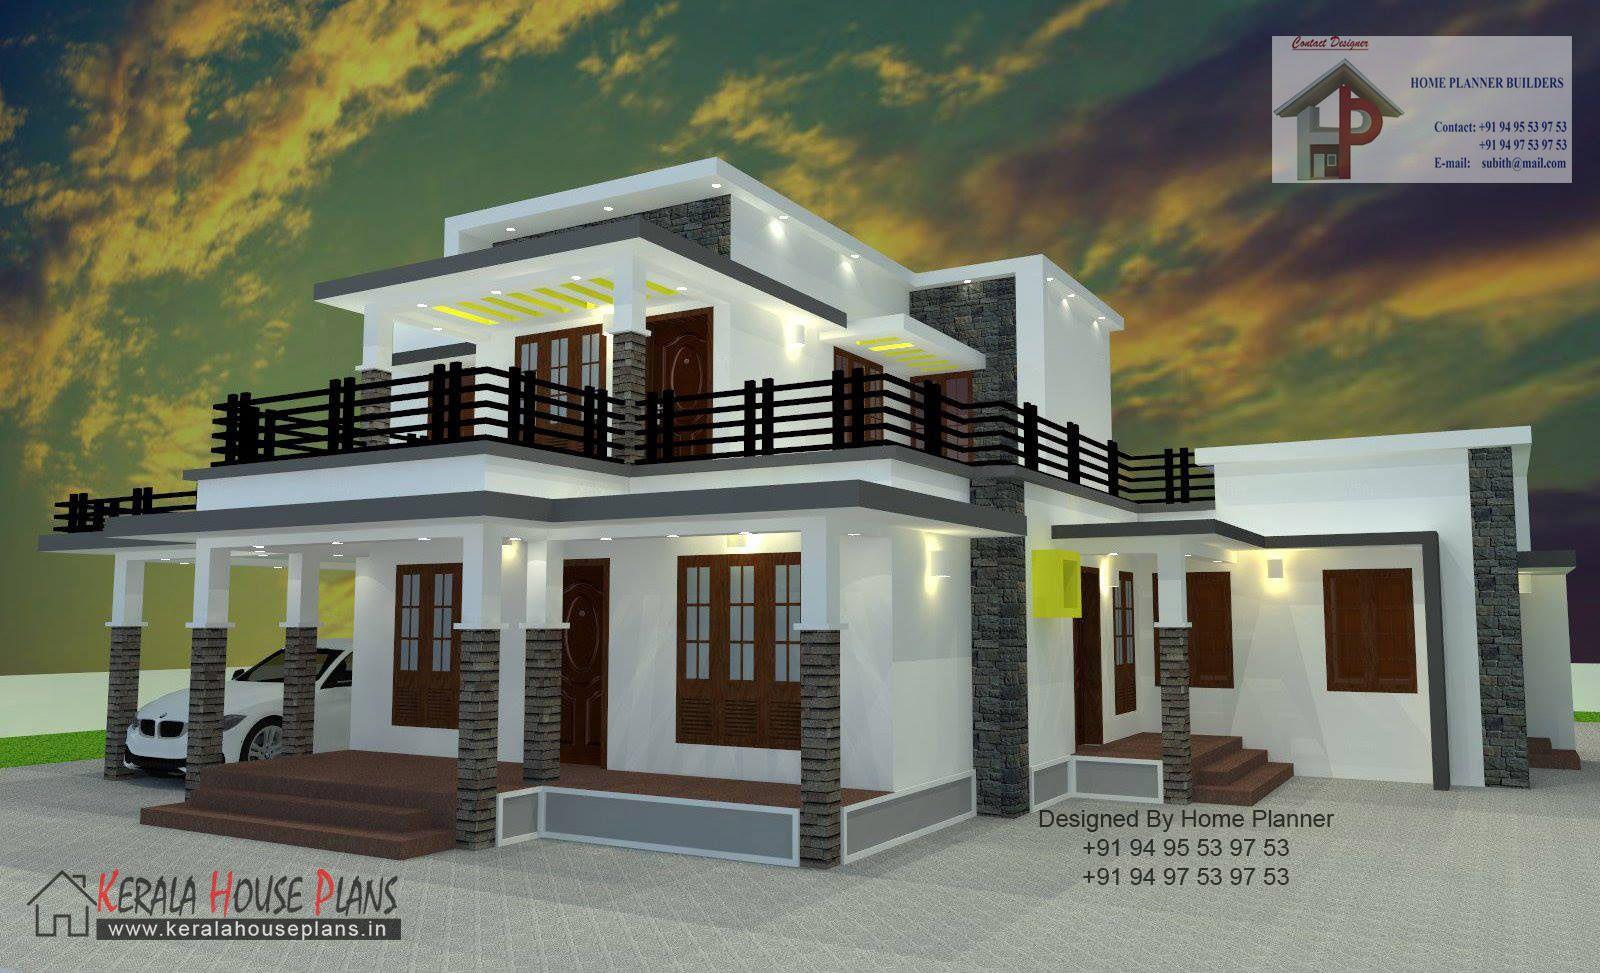 2000 sqft Box Type House   Kerala House Plans   House Plans   2000 sqft Box Type House   Kerala House Plans. Types Of Home Designs. Home Design Ideas